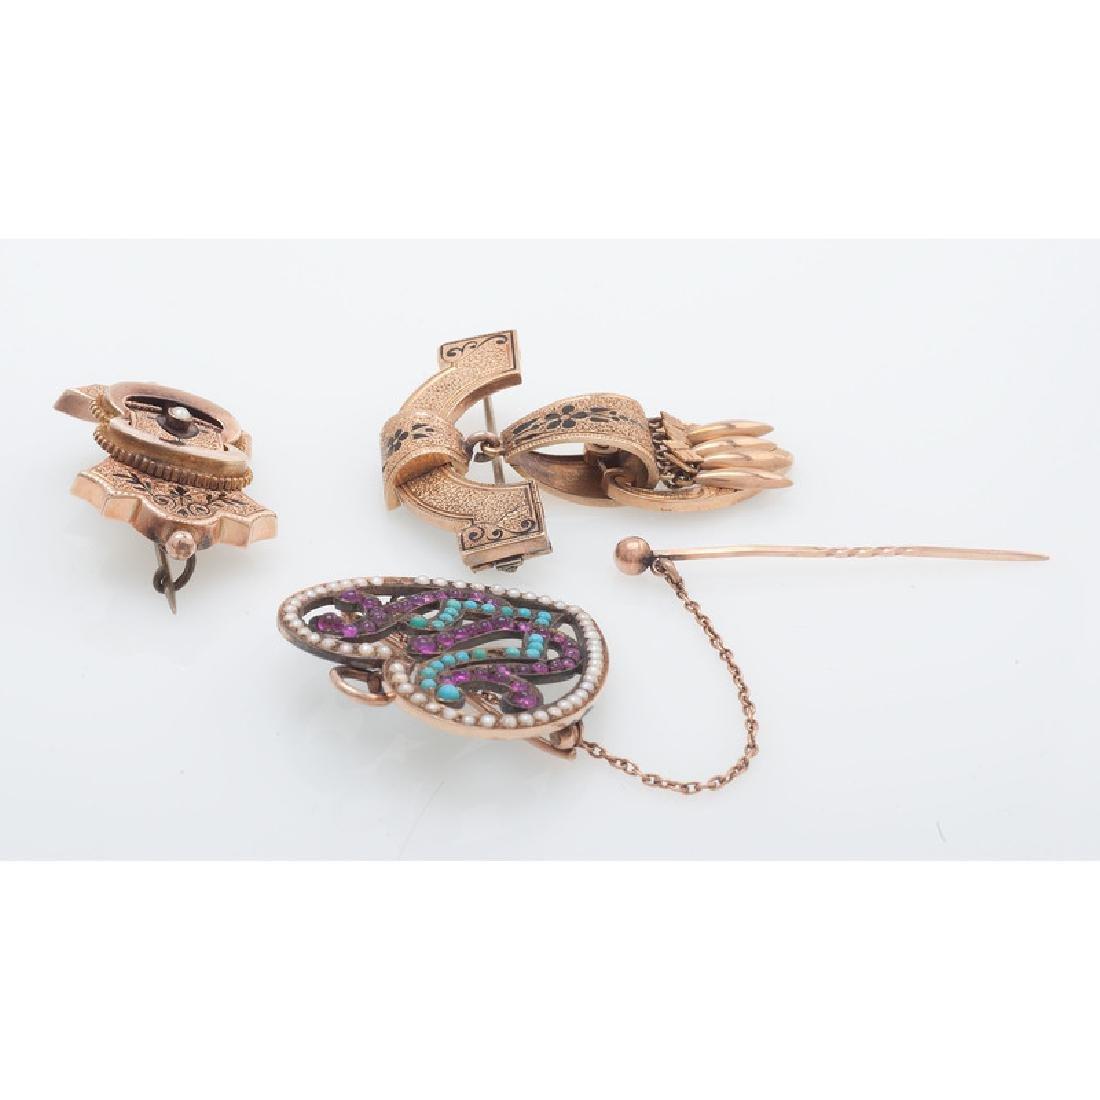 Karat Gold Victorian Brooches - 3